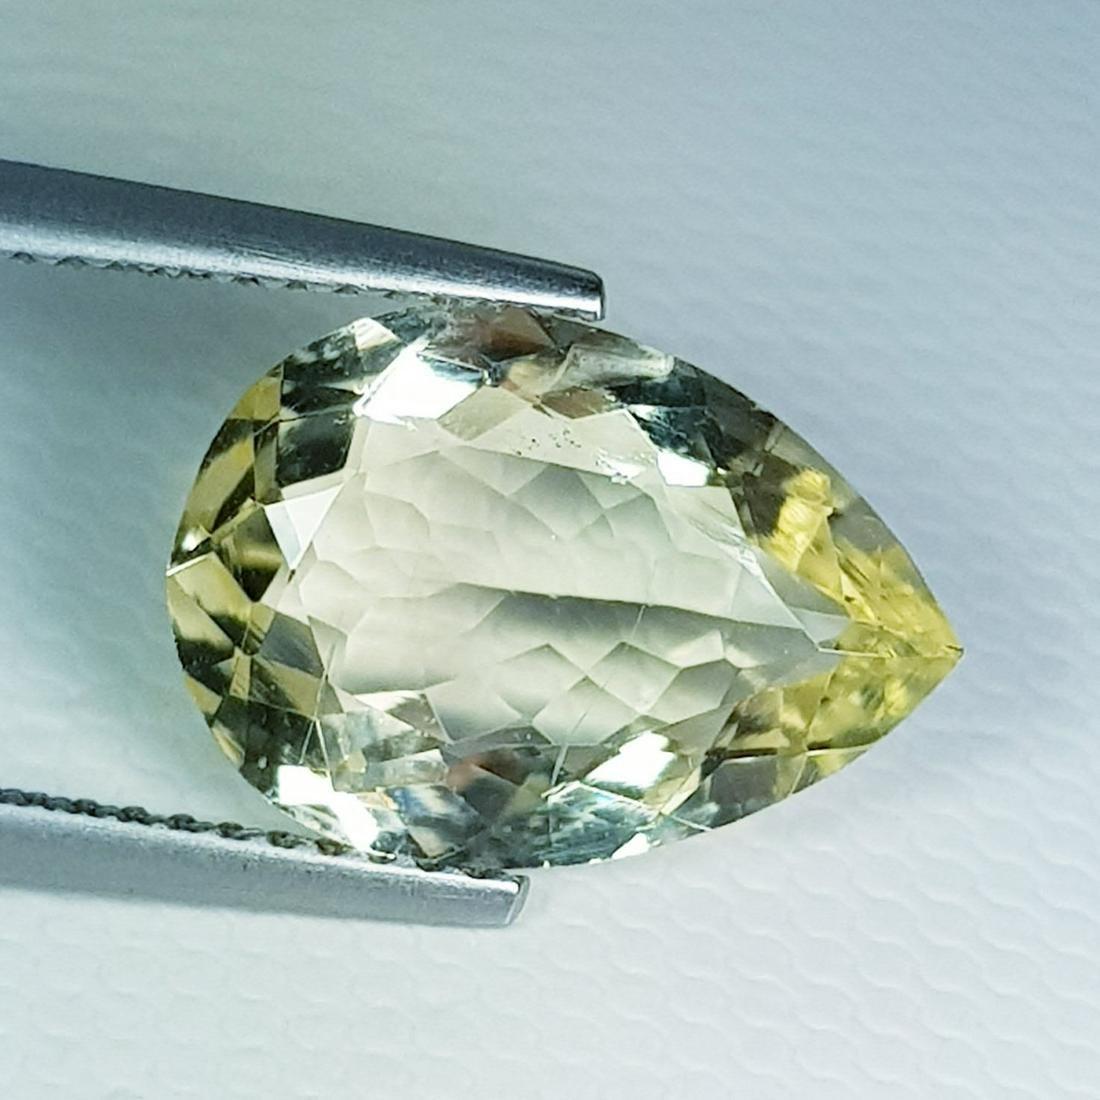 Natural Scapolite Pear Cut - 3.88 ct